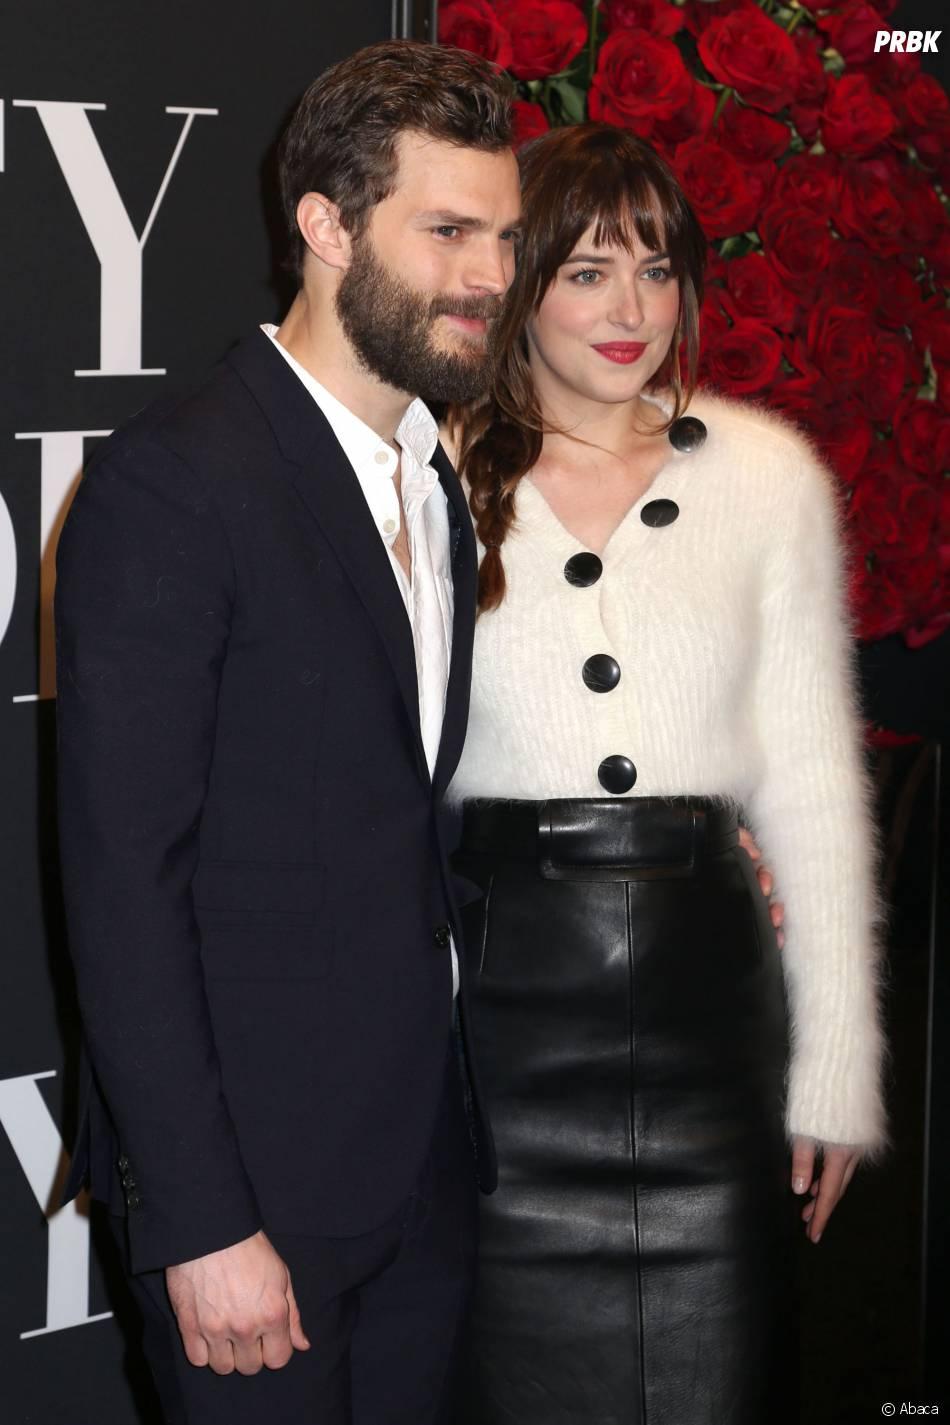 Fifty Shades of Grey : Jamie Dornan et Dakota Johnson se détestent selon les rumeurs